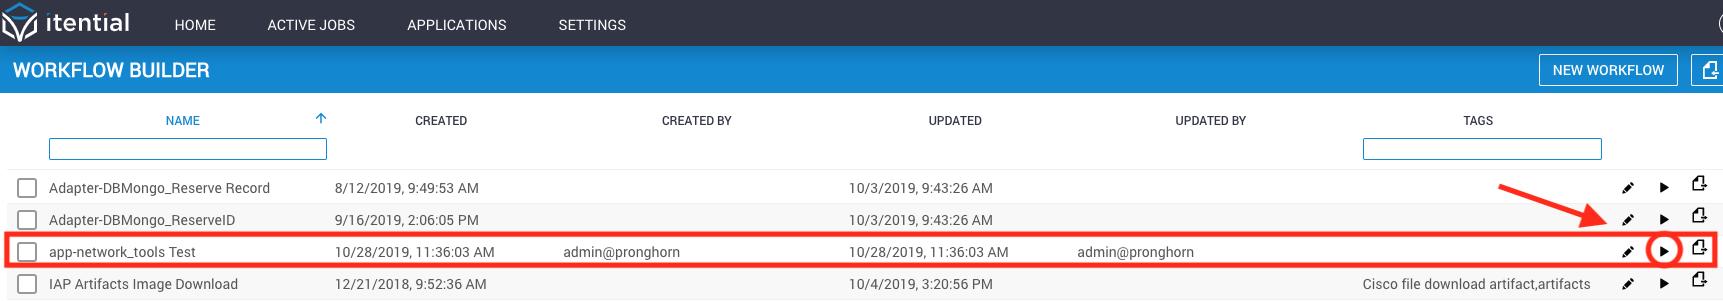 app-network_tools Test start workflow